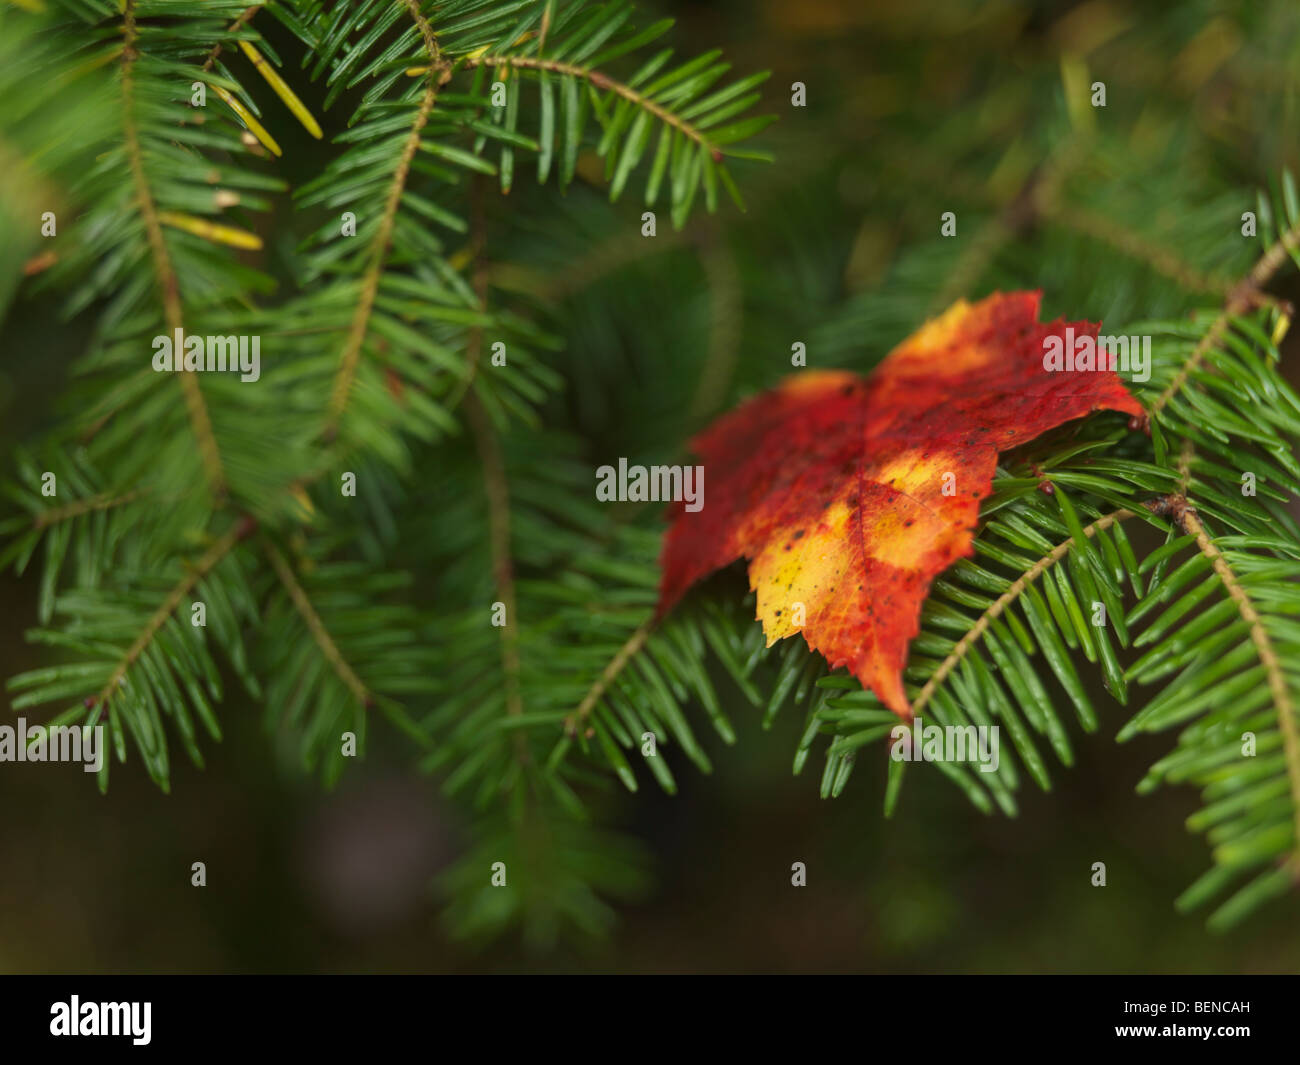 Red fallen maple leaf on Balsam fir - Stock Image